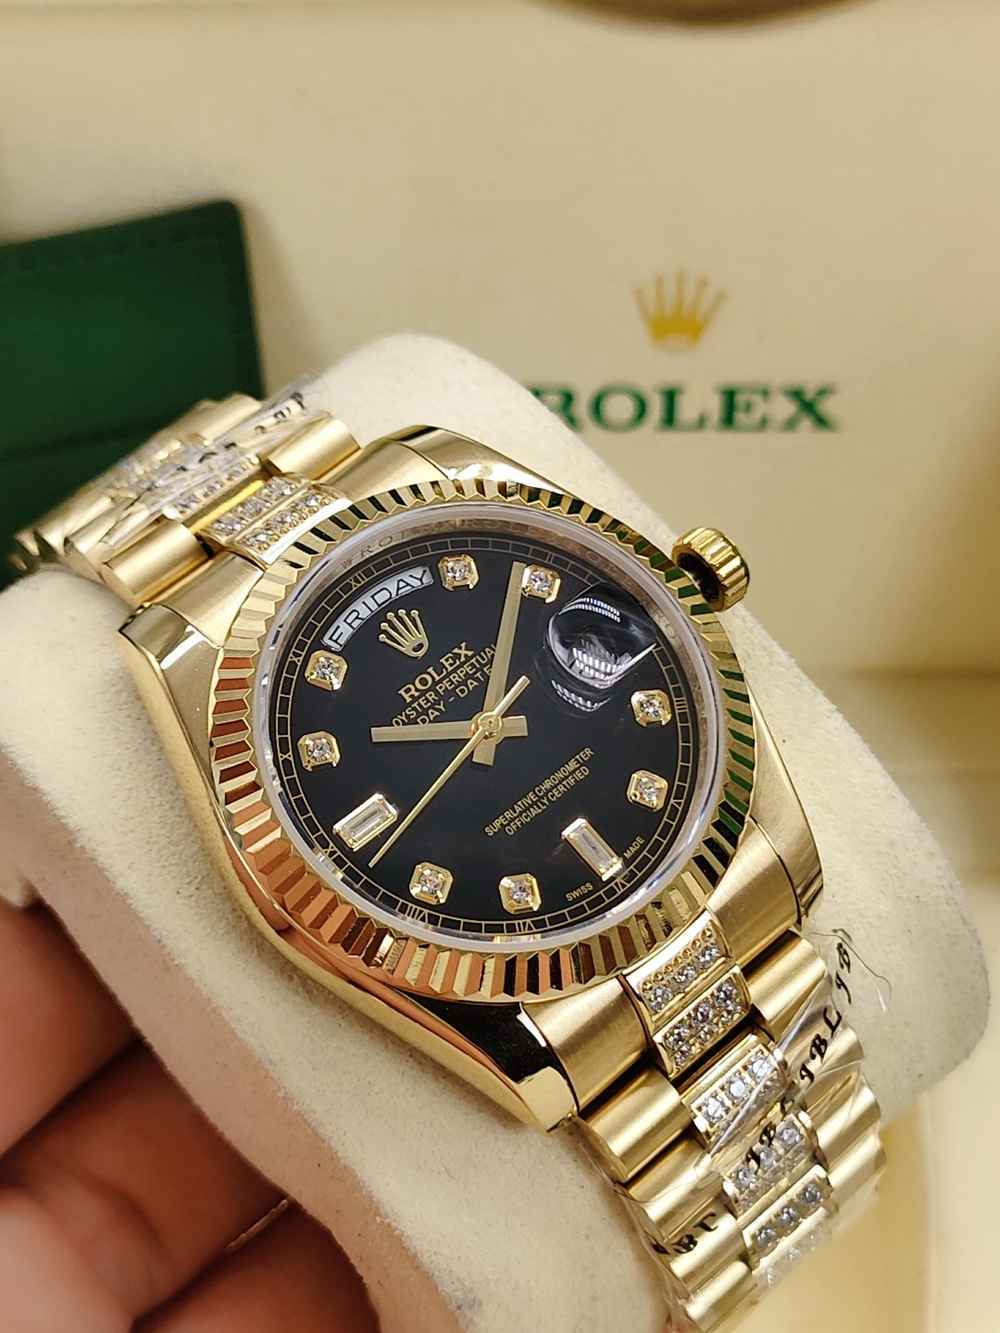 DayDate 36mm Gold/black AAA automatic 2813 fluted bezel diamonds strap S040